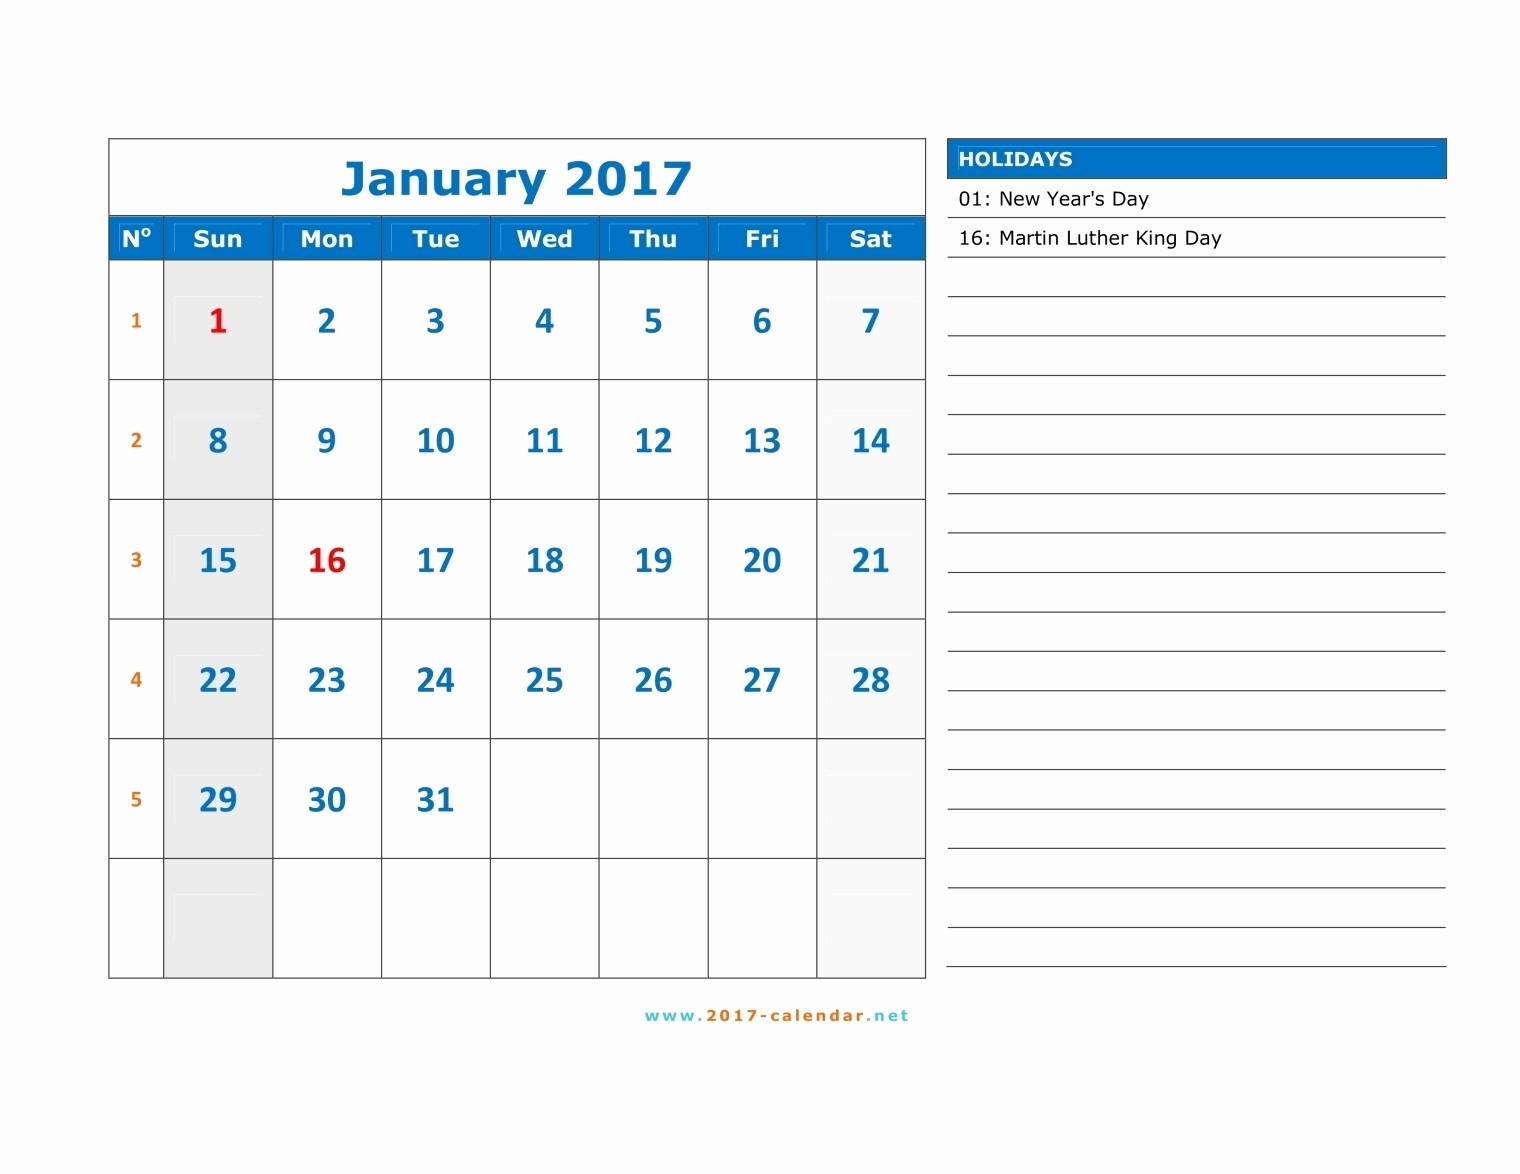 Printable 3 Month Calendar 2017 Beautiful 3 Month Calendar View 2017 2017